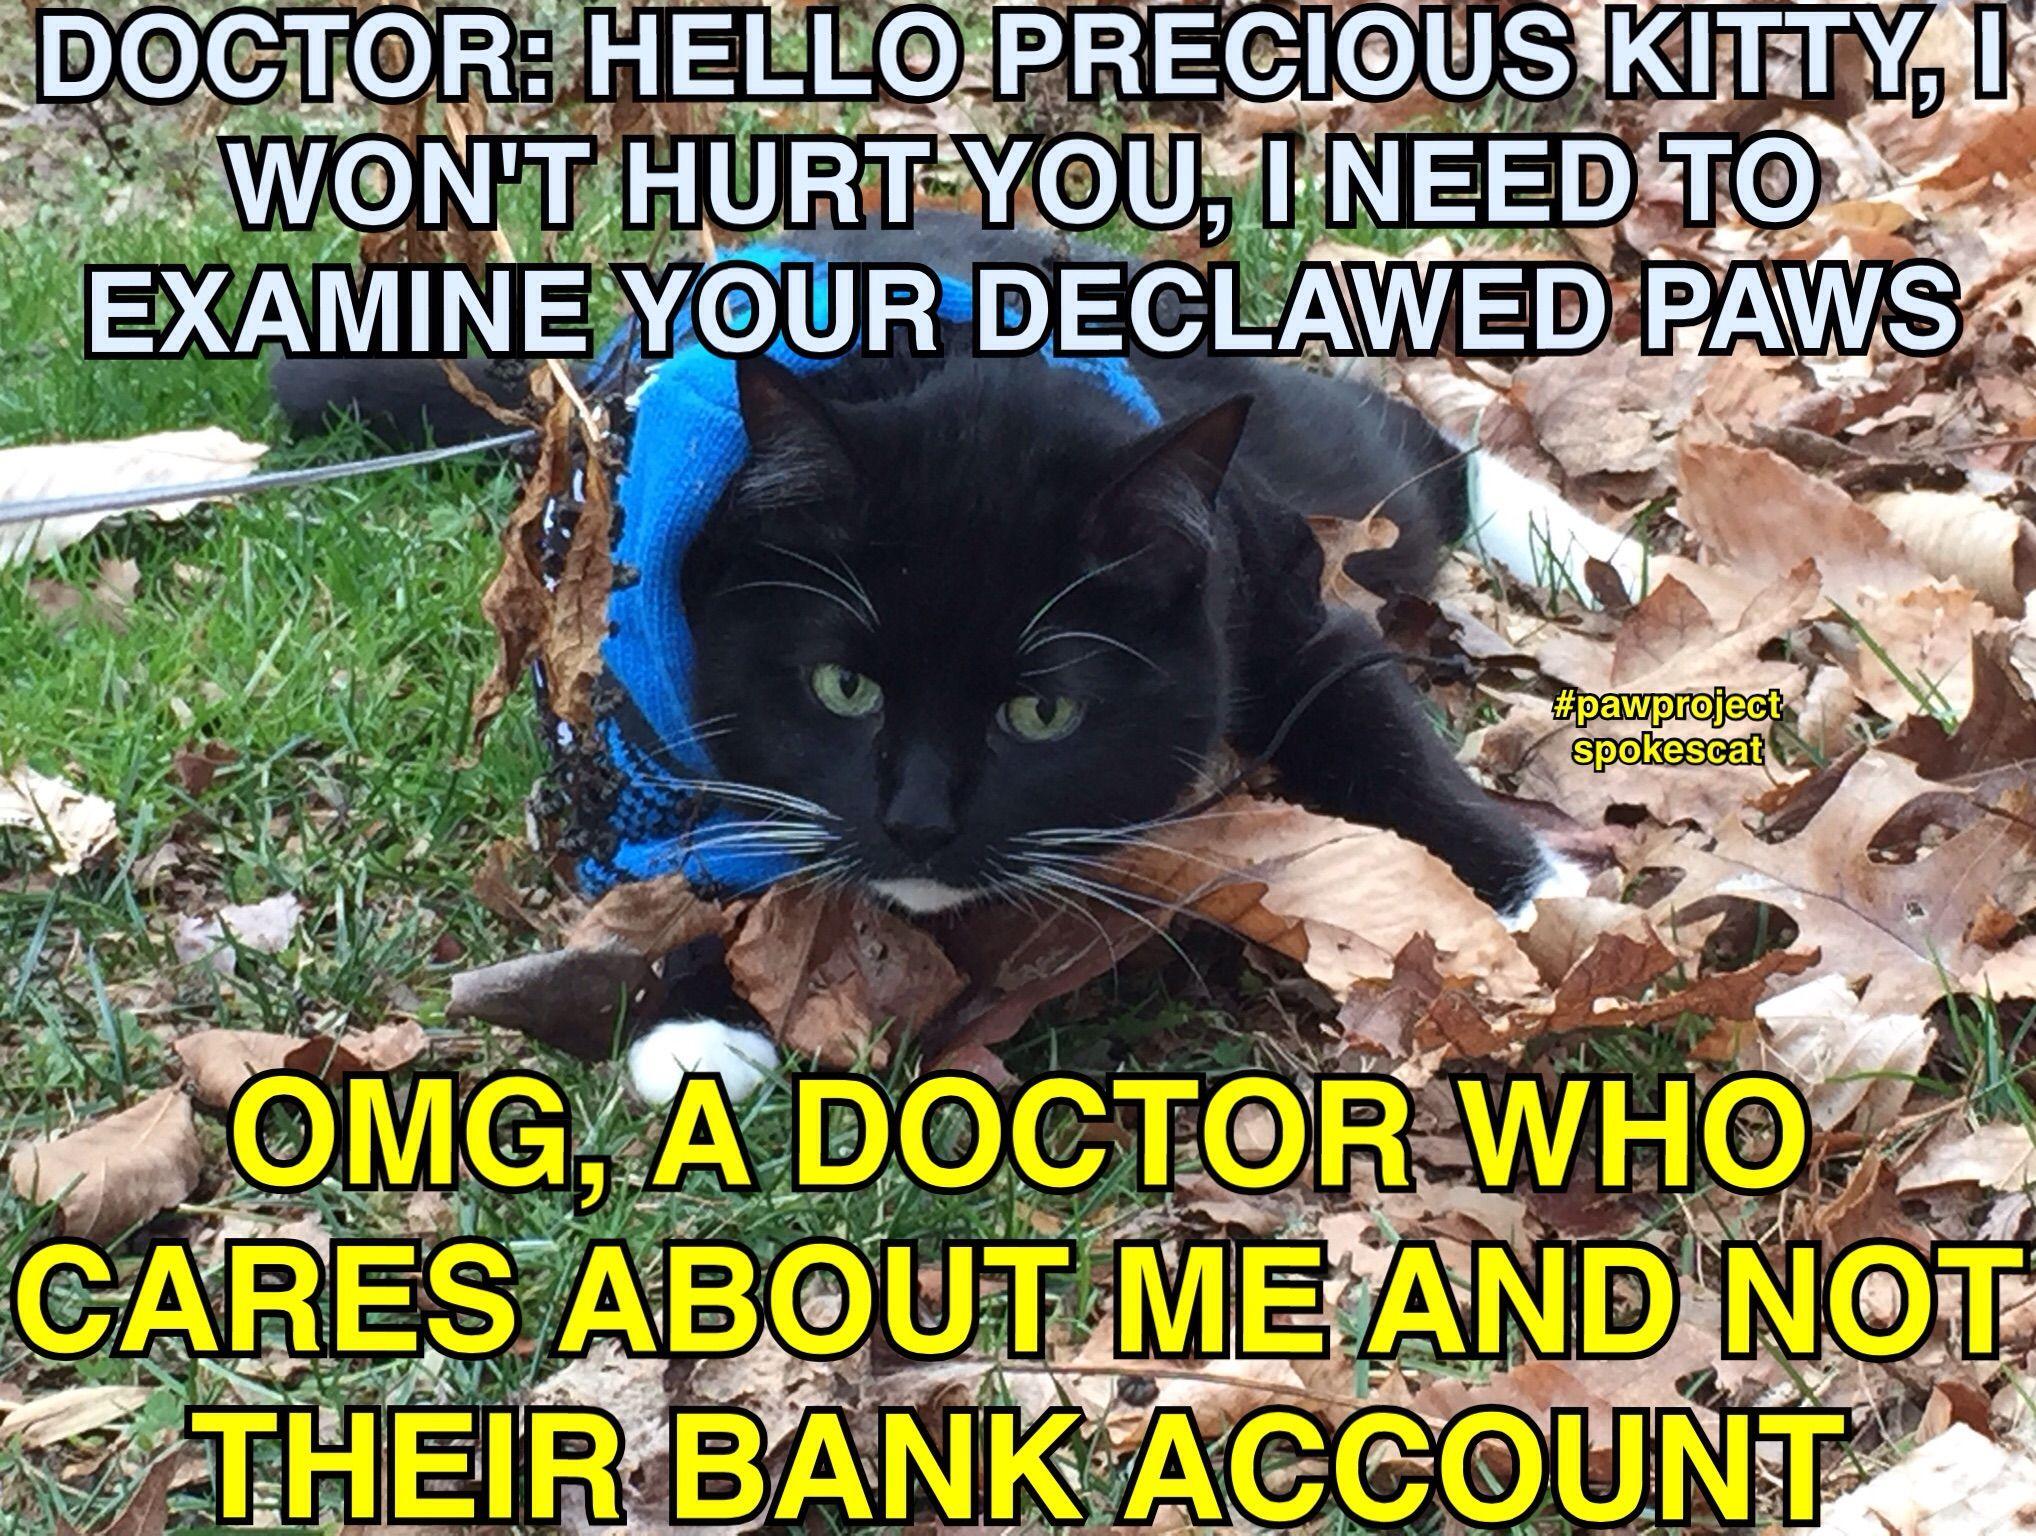 God Help Those Cats Who Suffer Please Please Help End Declawing Amen Vet Student Vet Med Vet School